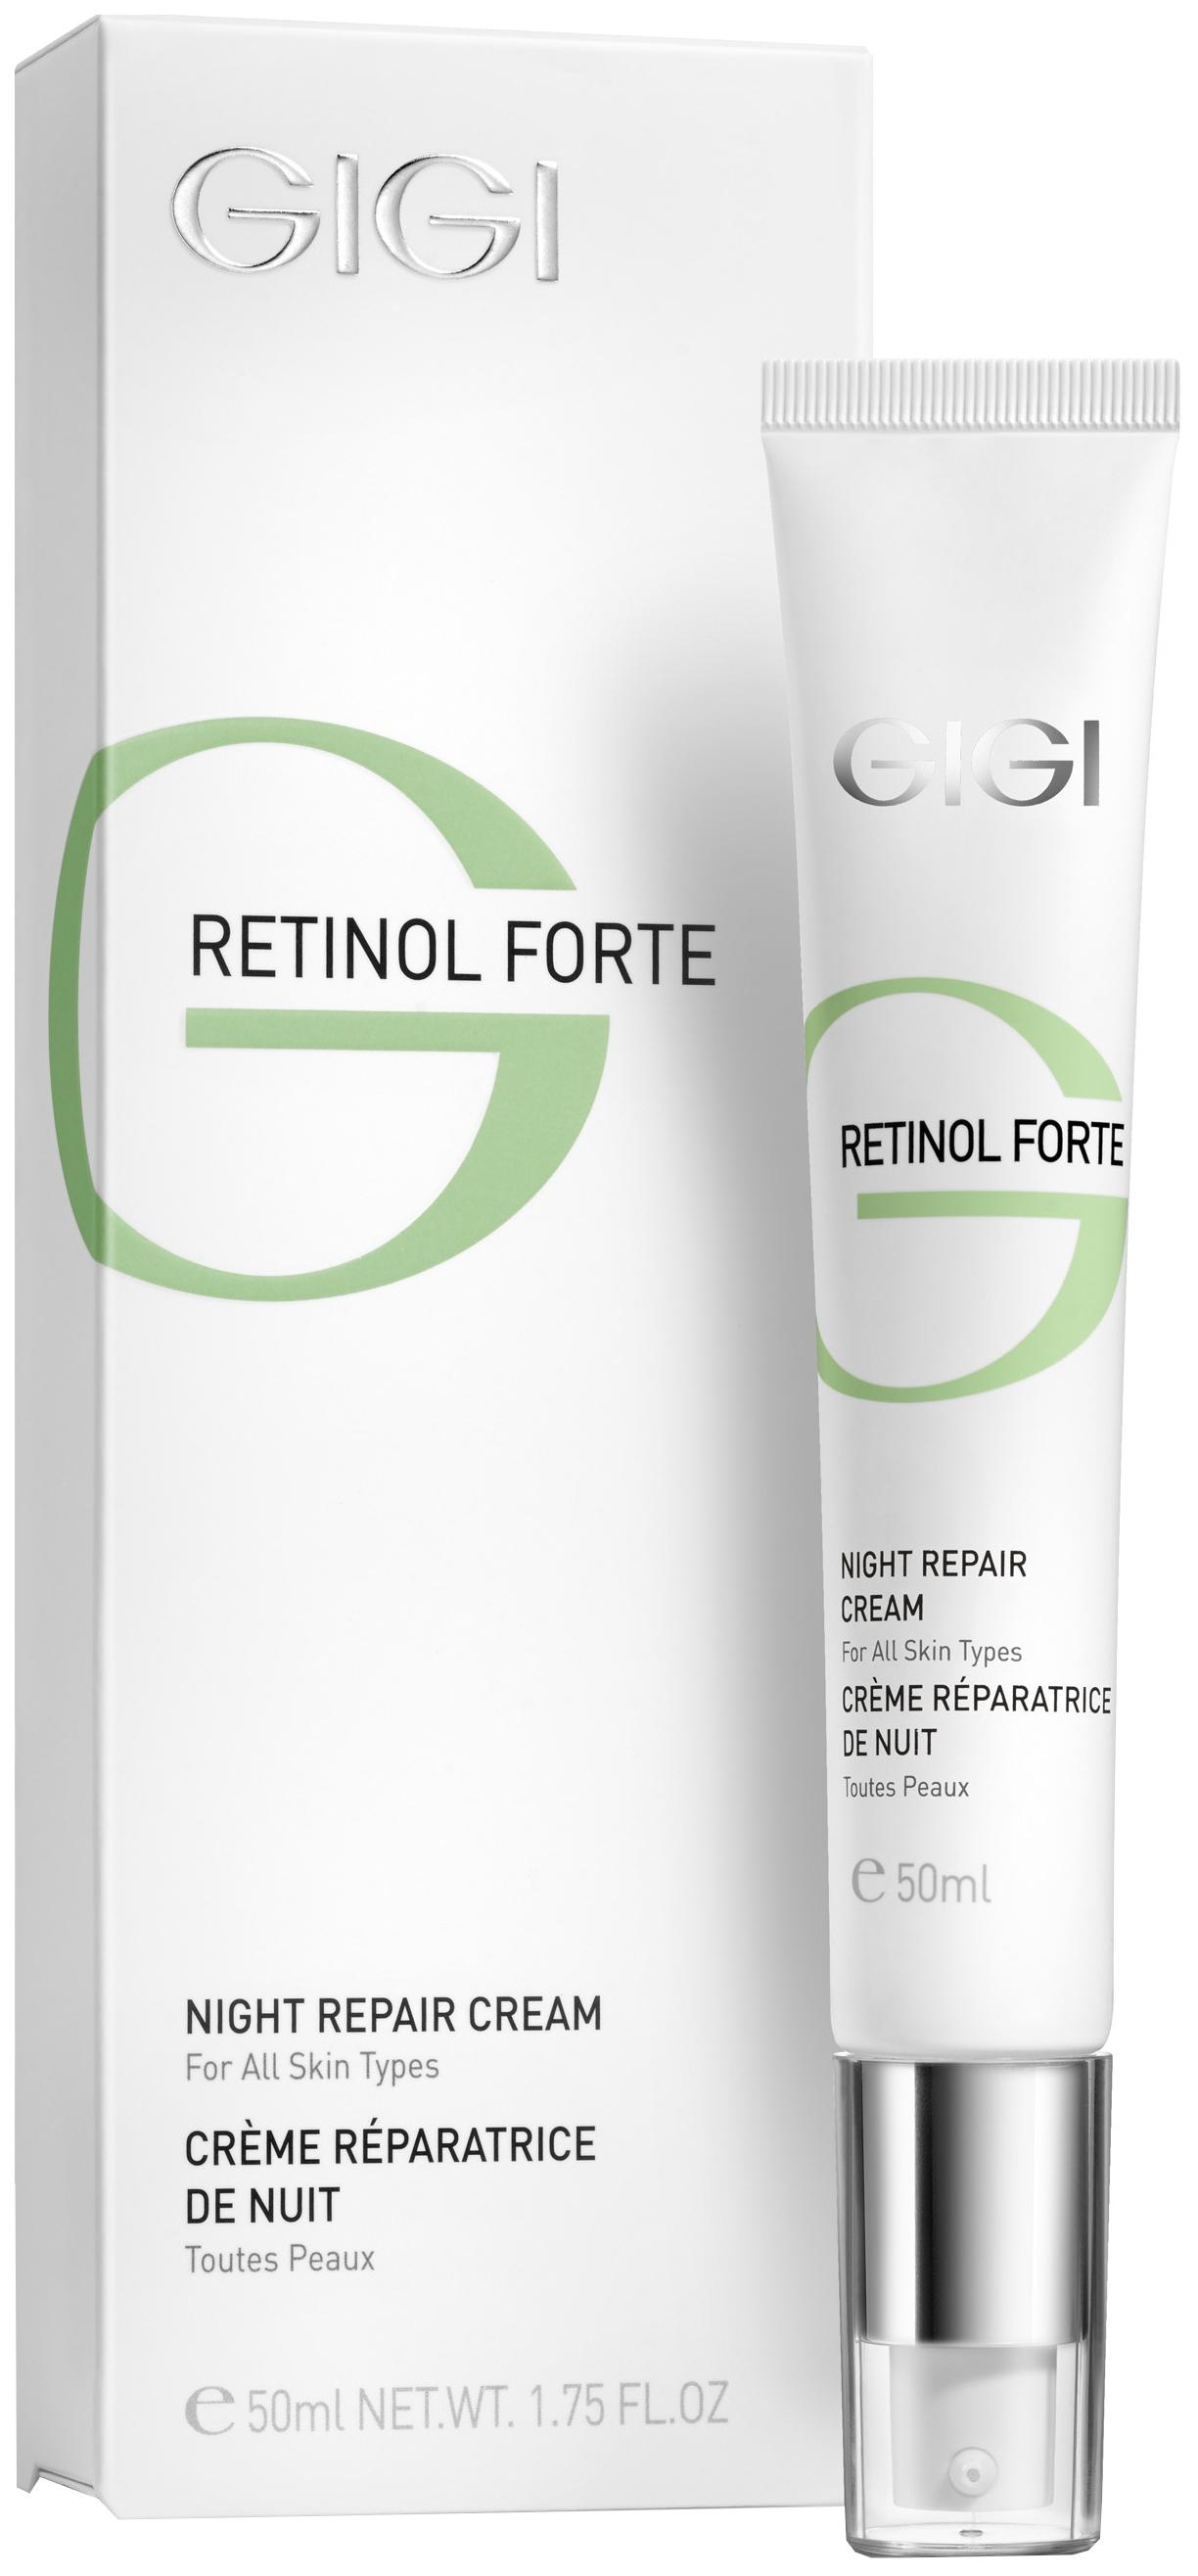 Крем для лица GIGI ночной восстанавливающий Retinol Forte для всех типов кожи 50 мл фото